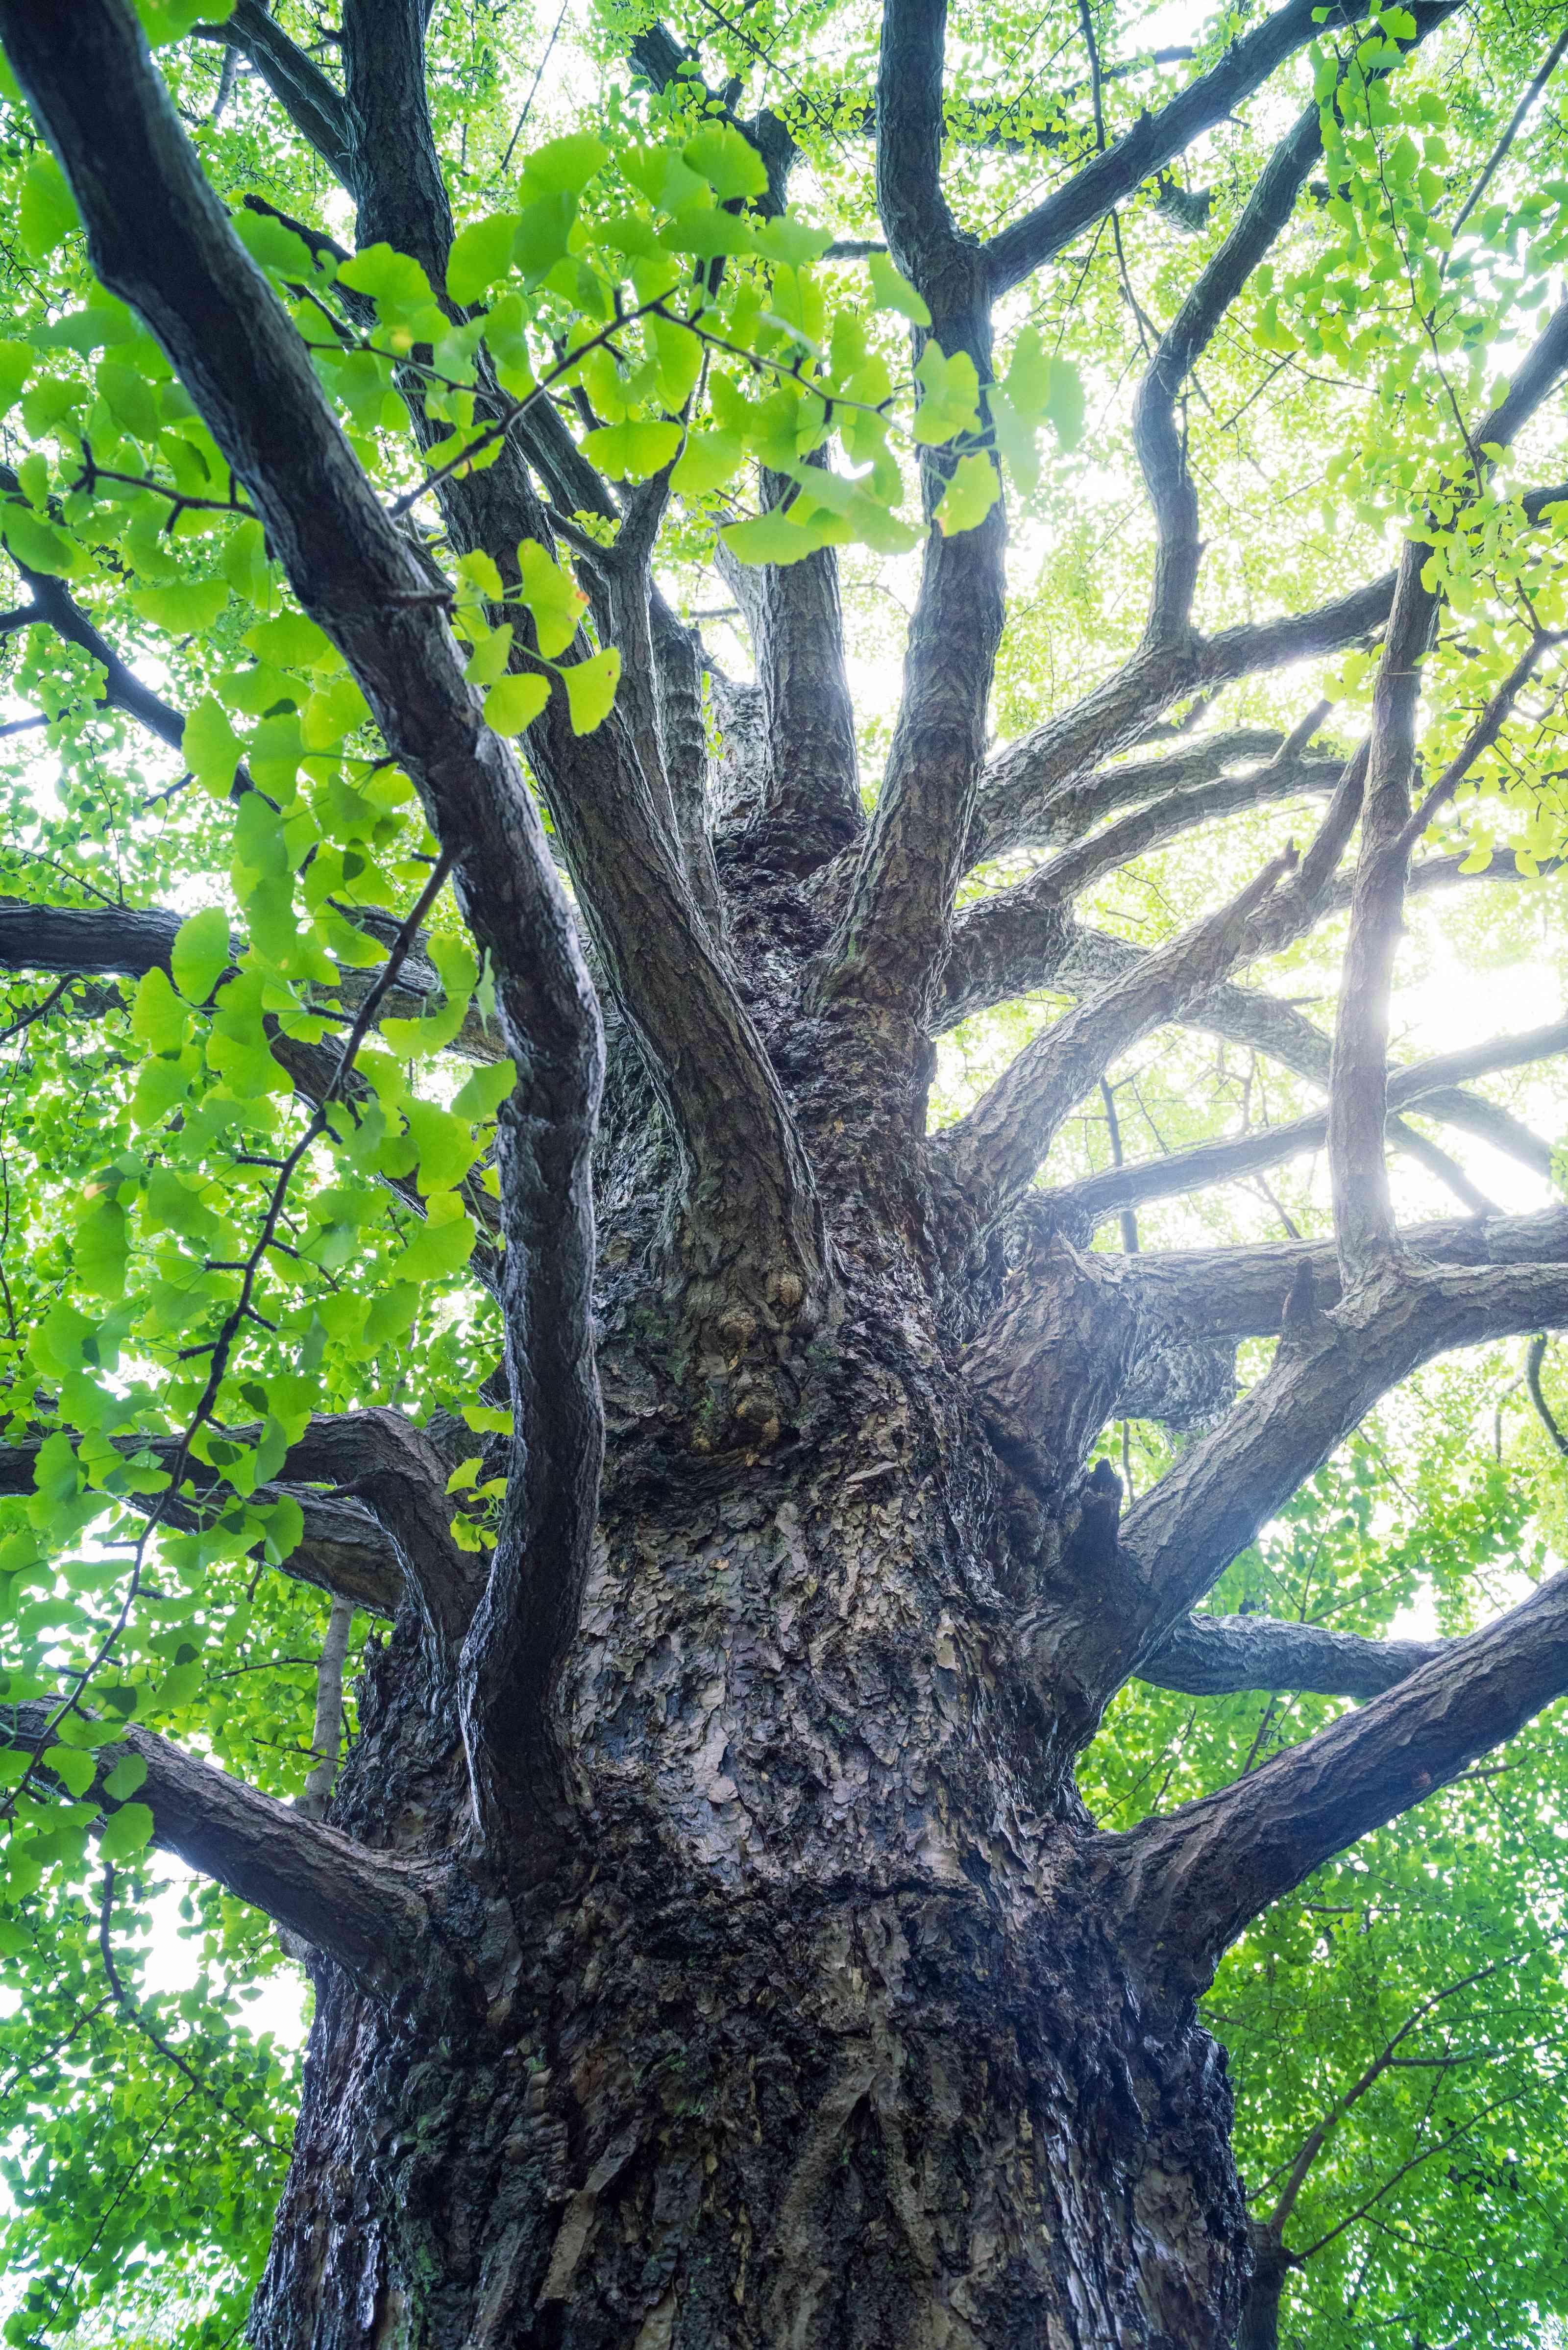 ginkgo biloba tree with green leaves